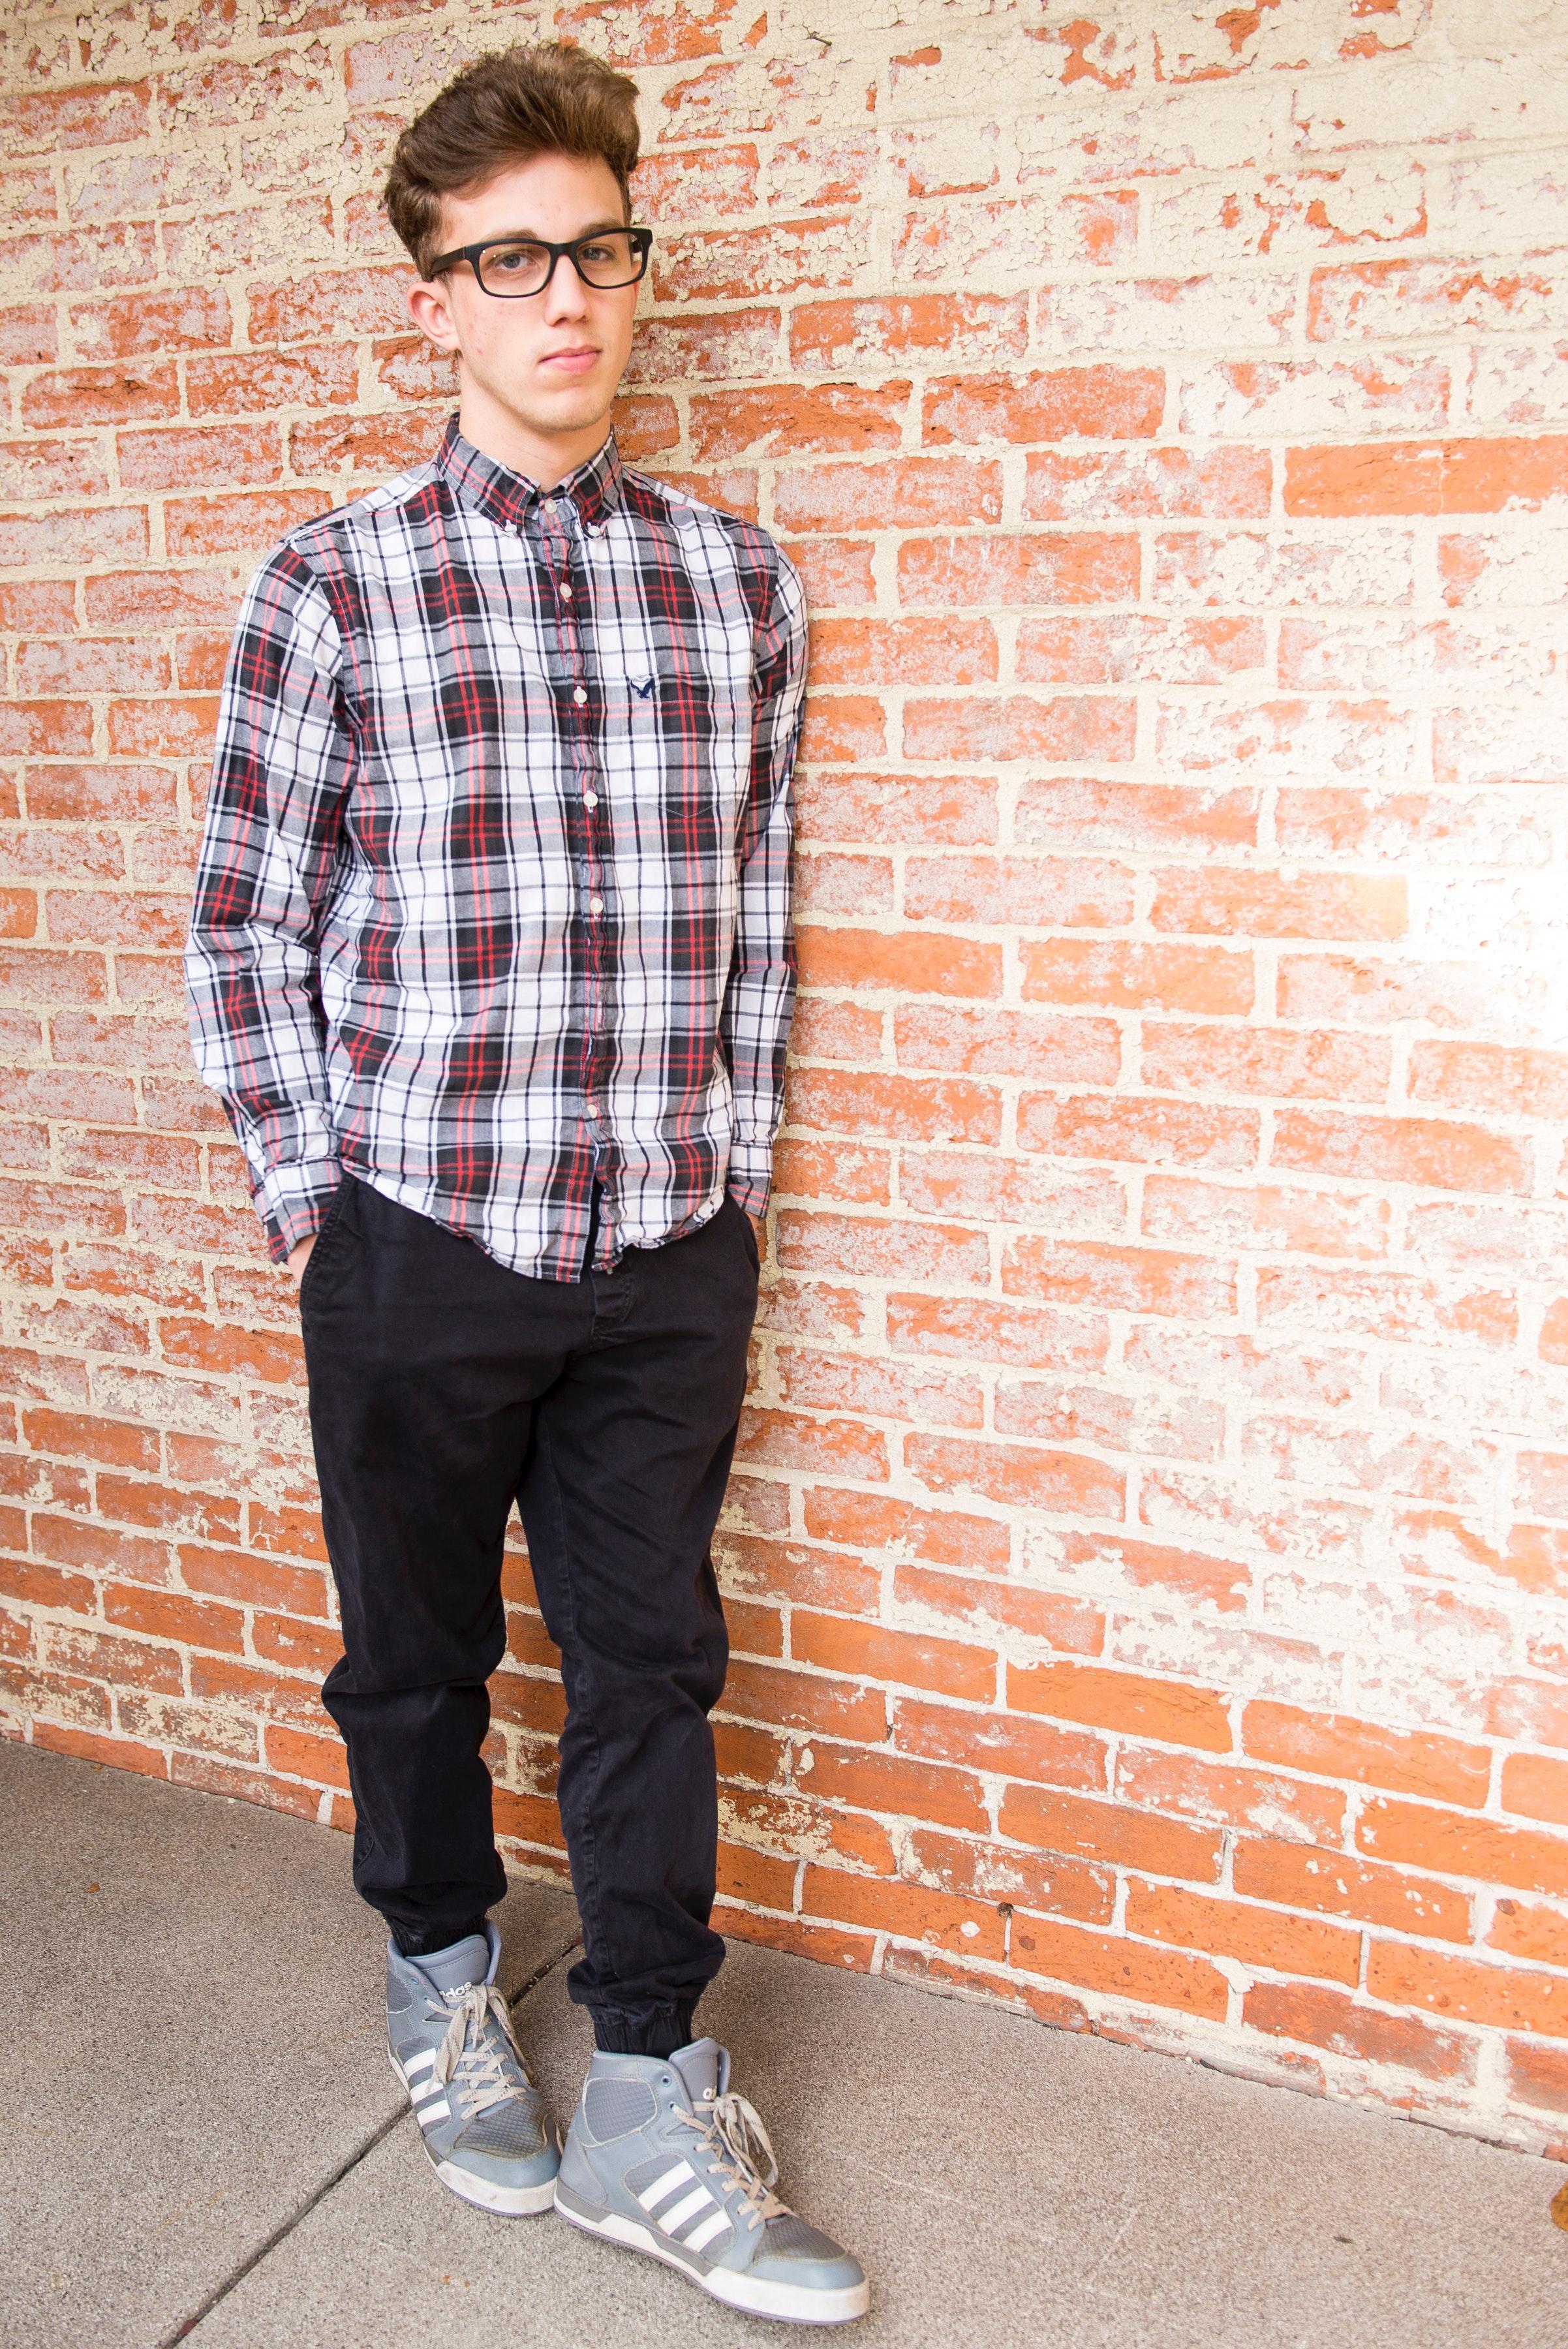 Man wearing plaid dress shirt and black pants photo